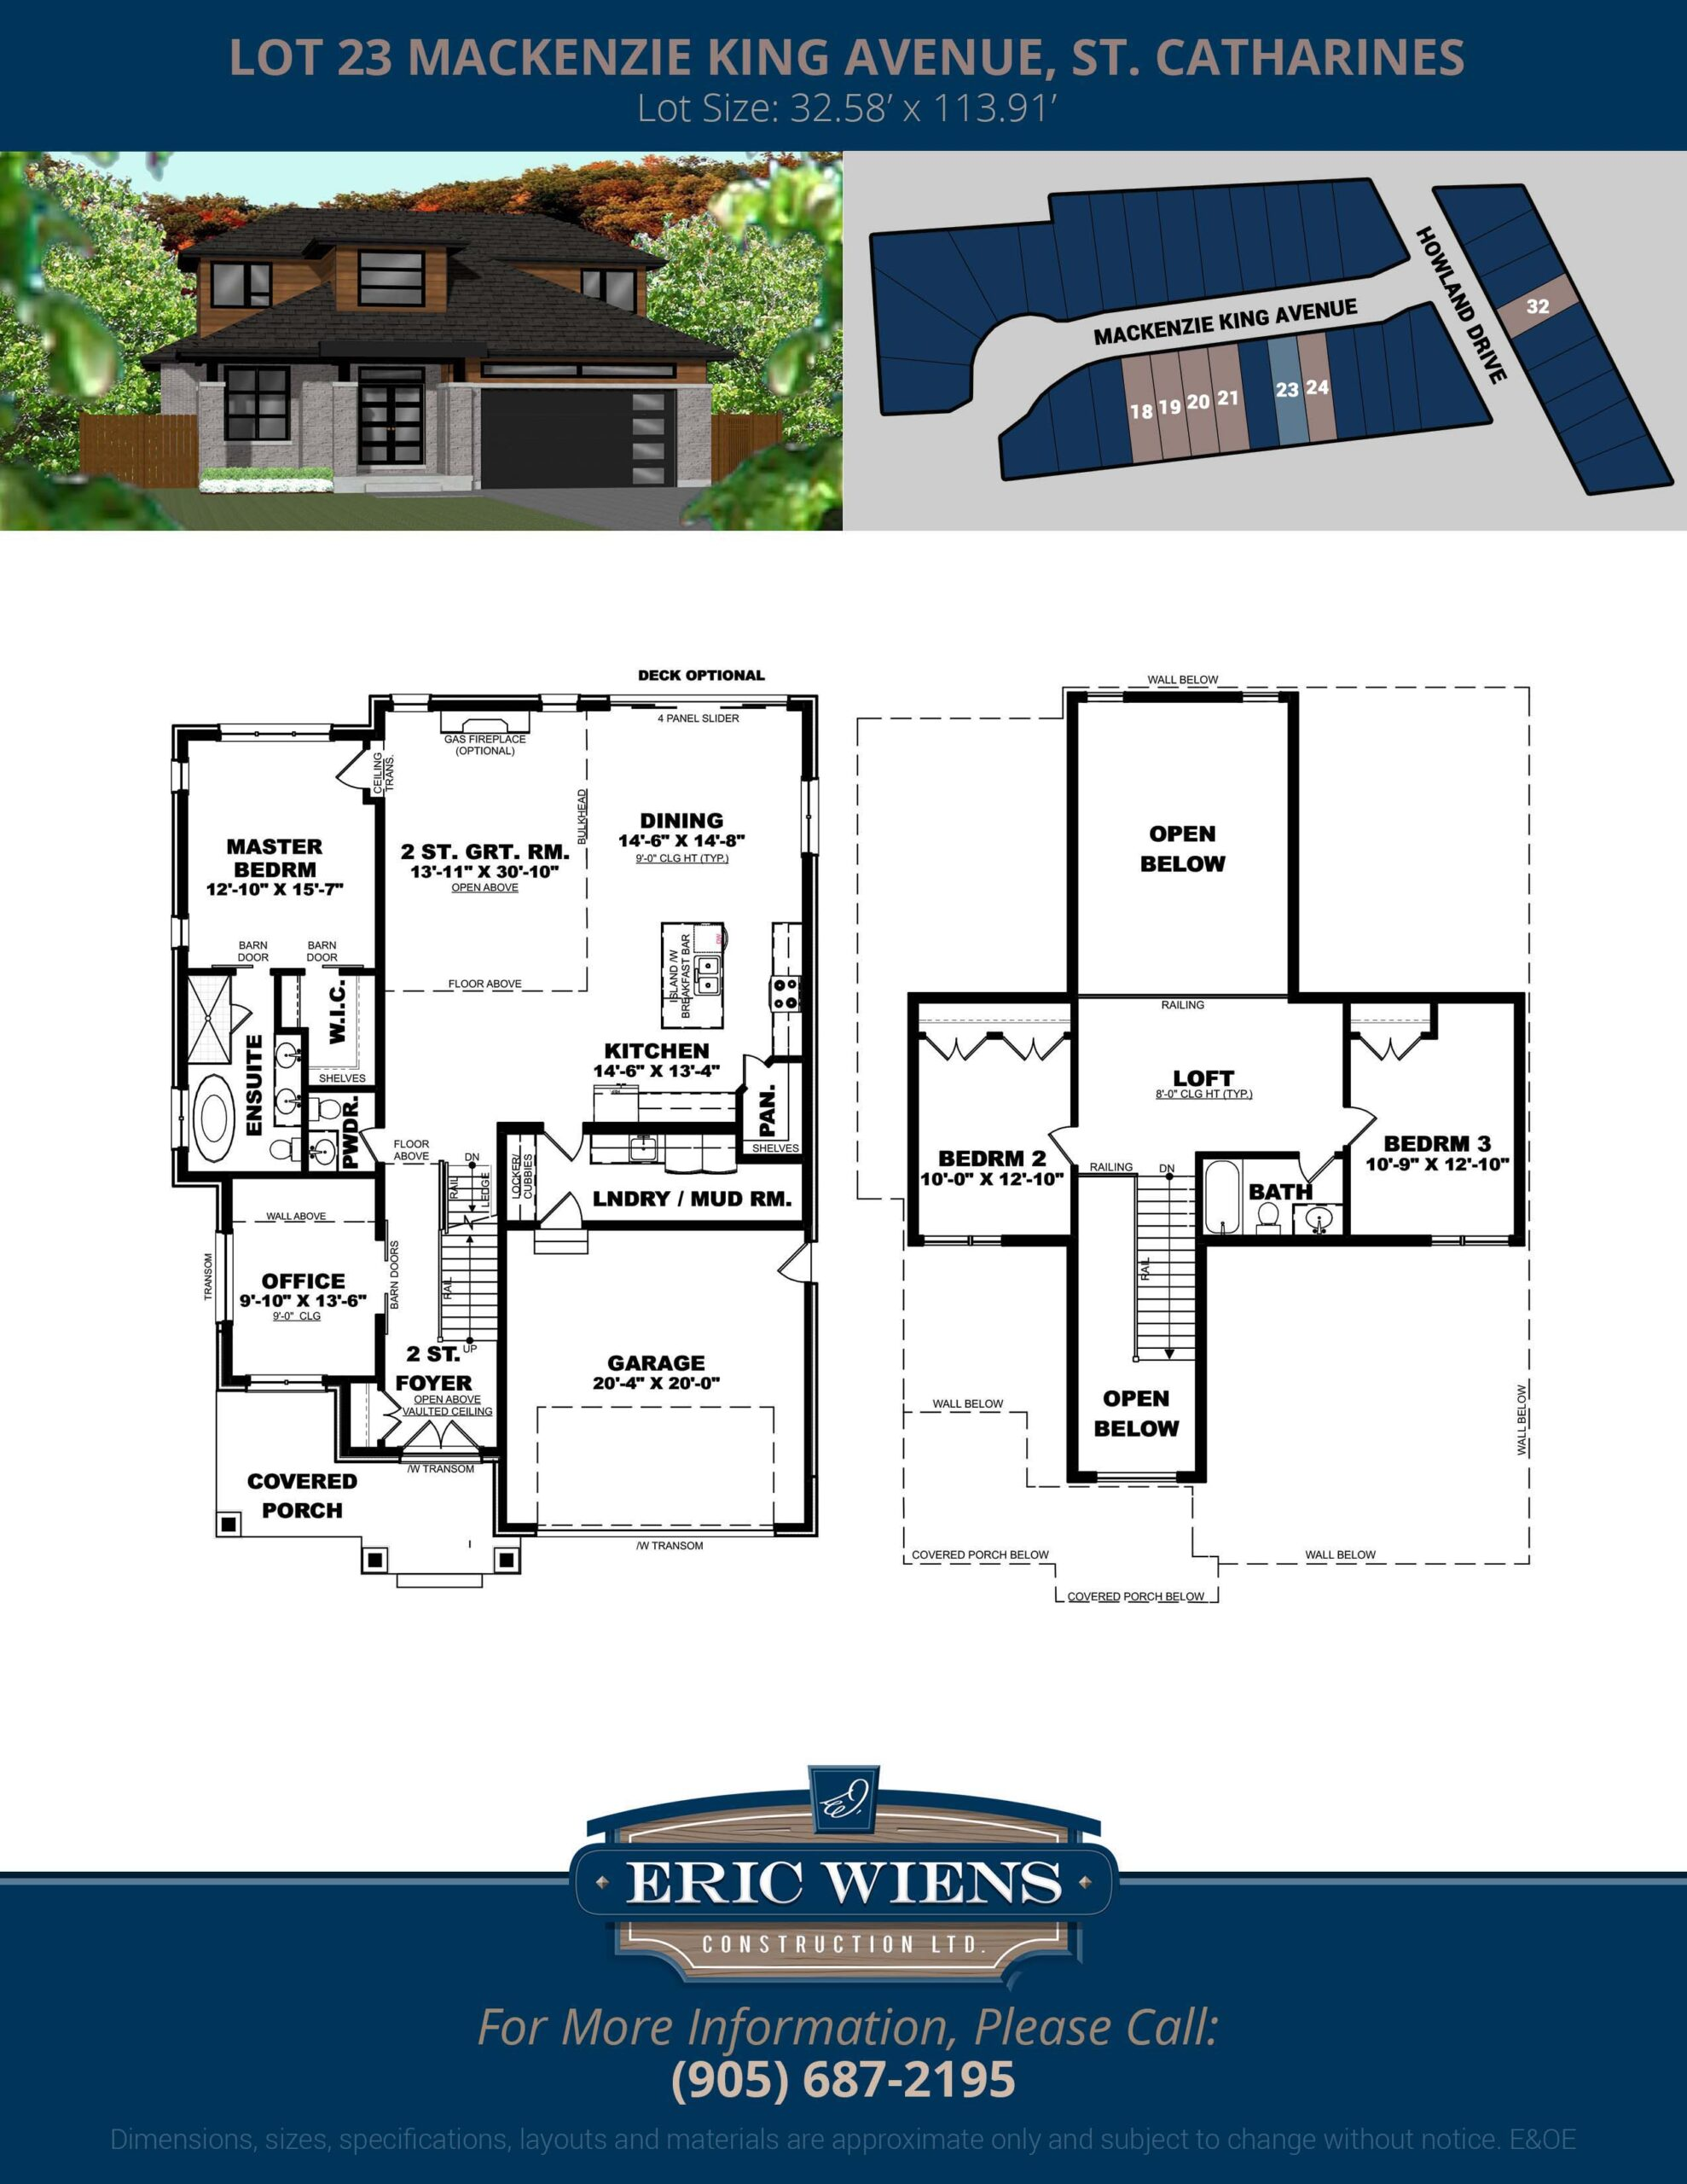 Lot 23 Mackenzie King Avenue Floor Plan